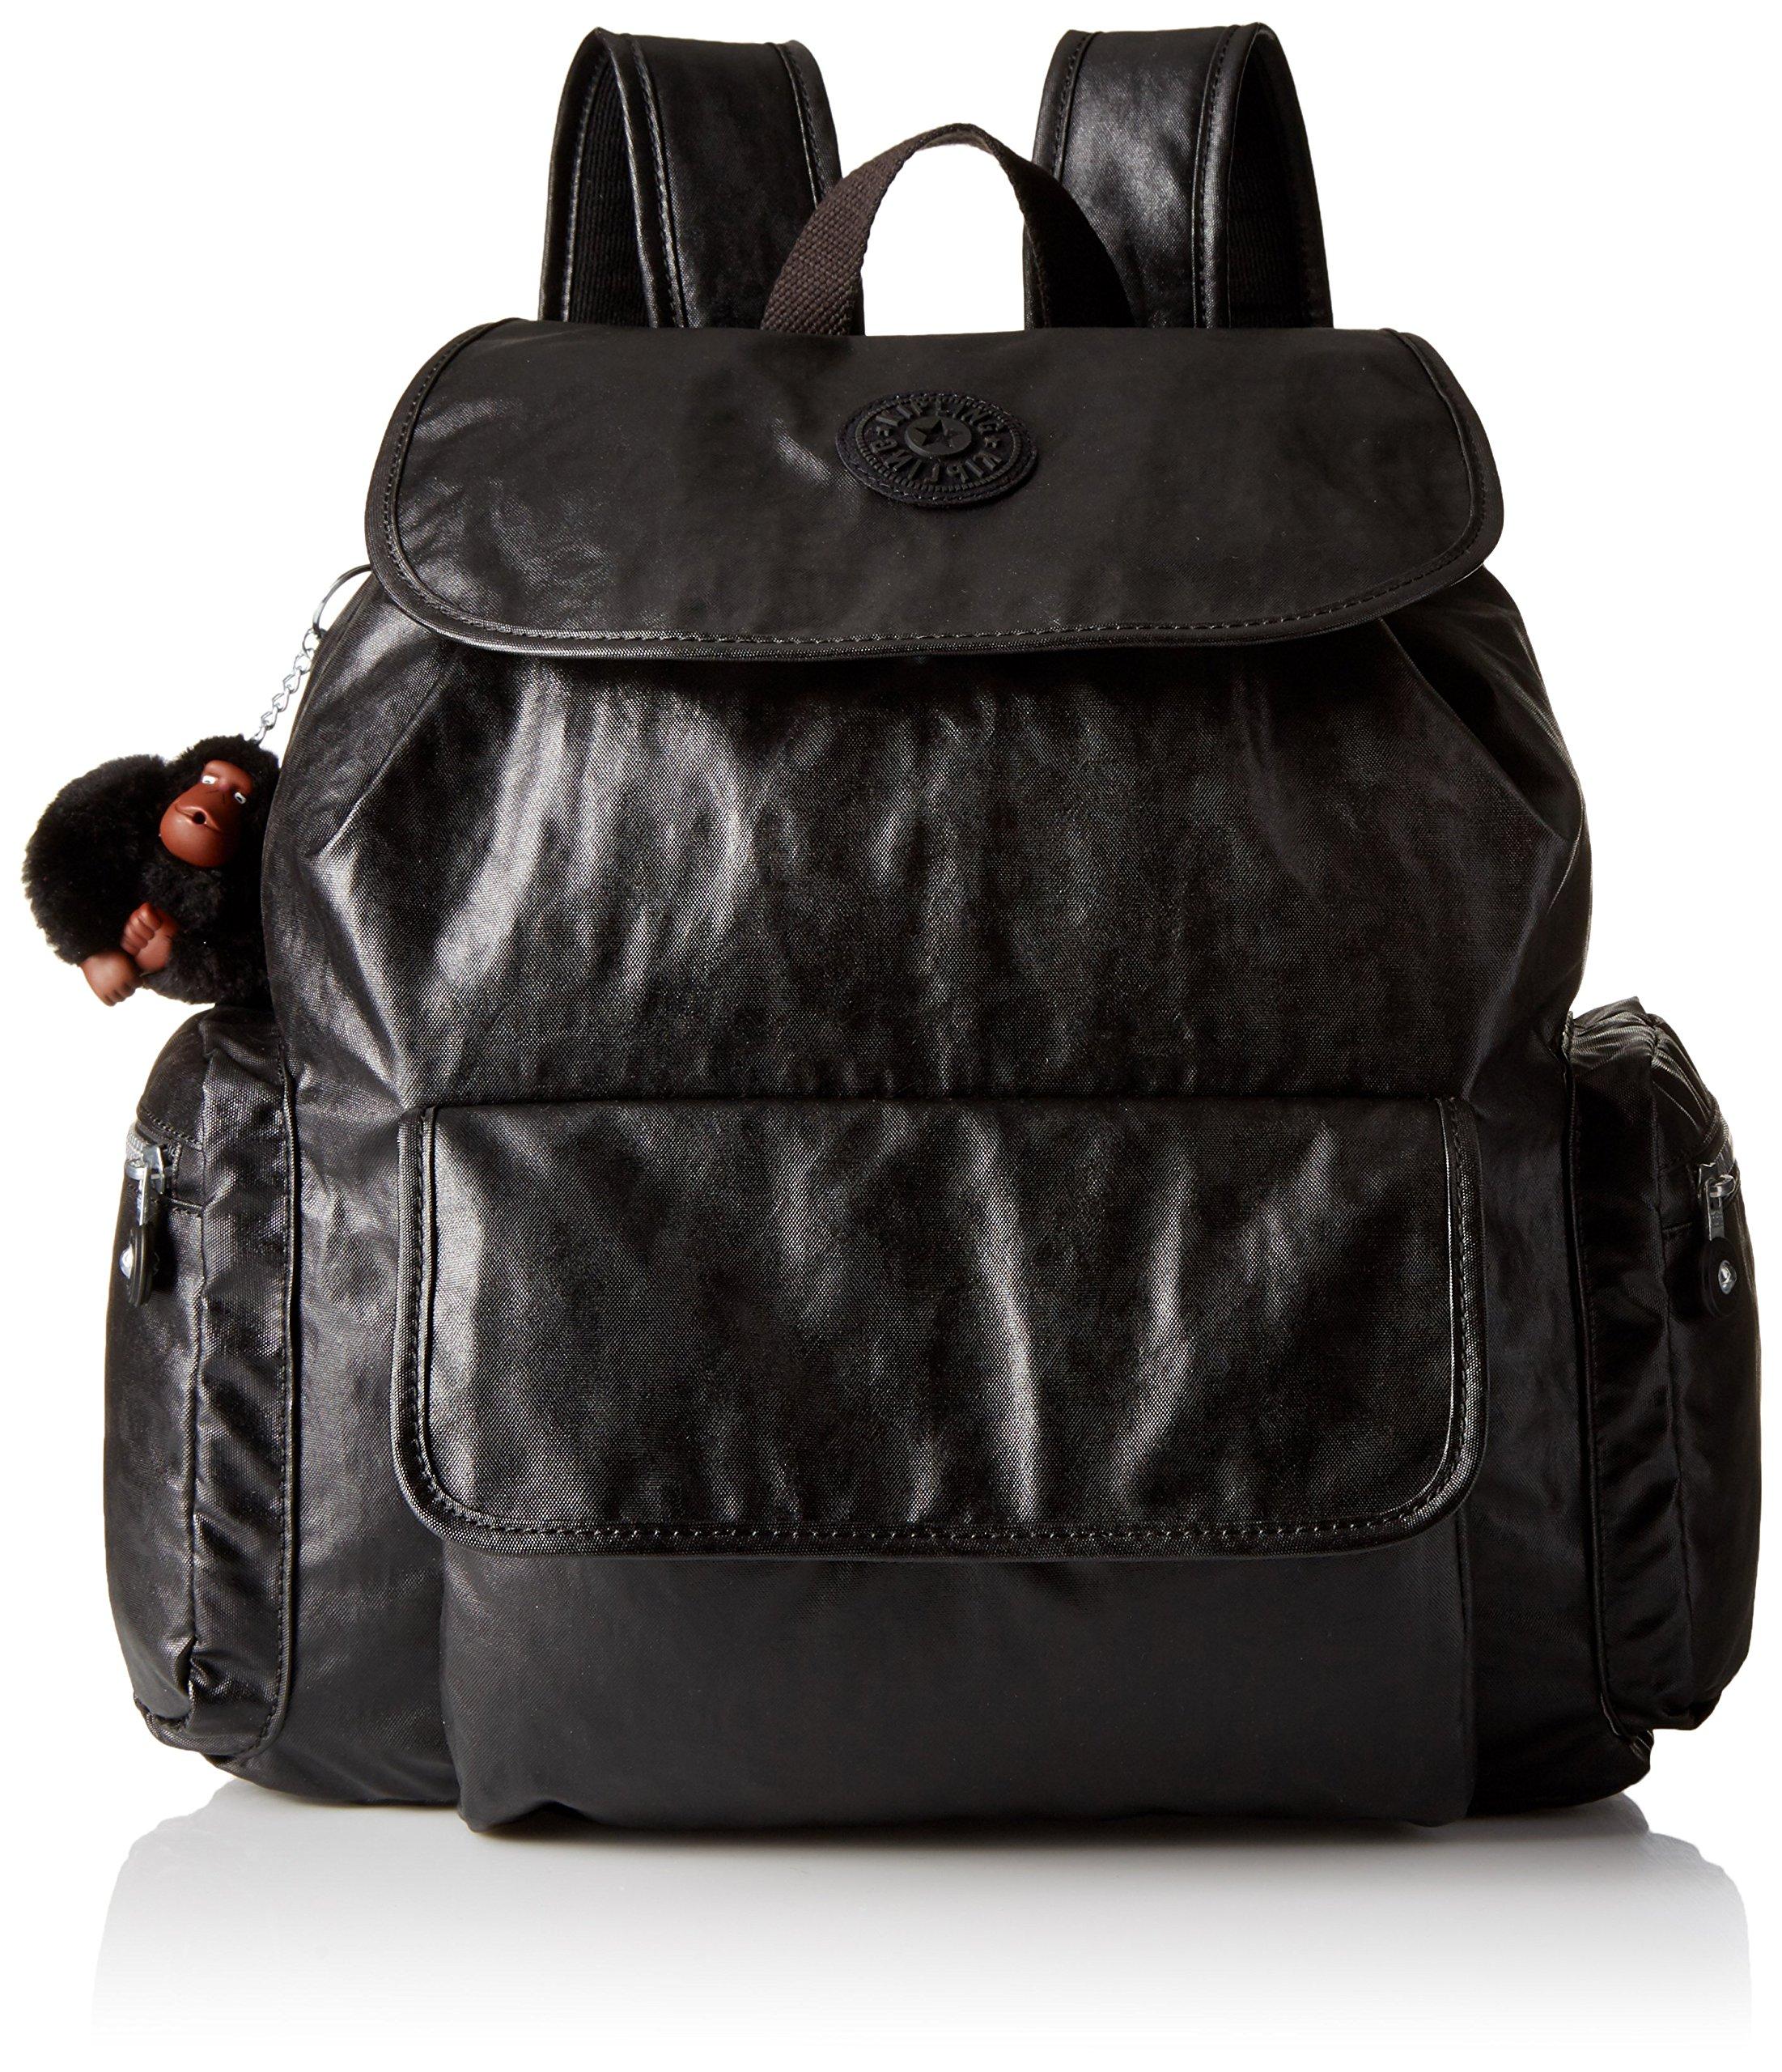 Kipling Women's Kirsty Backpack, Lacquer Black by Kipling